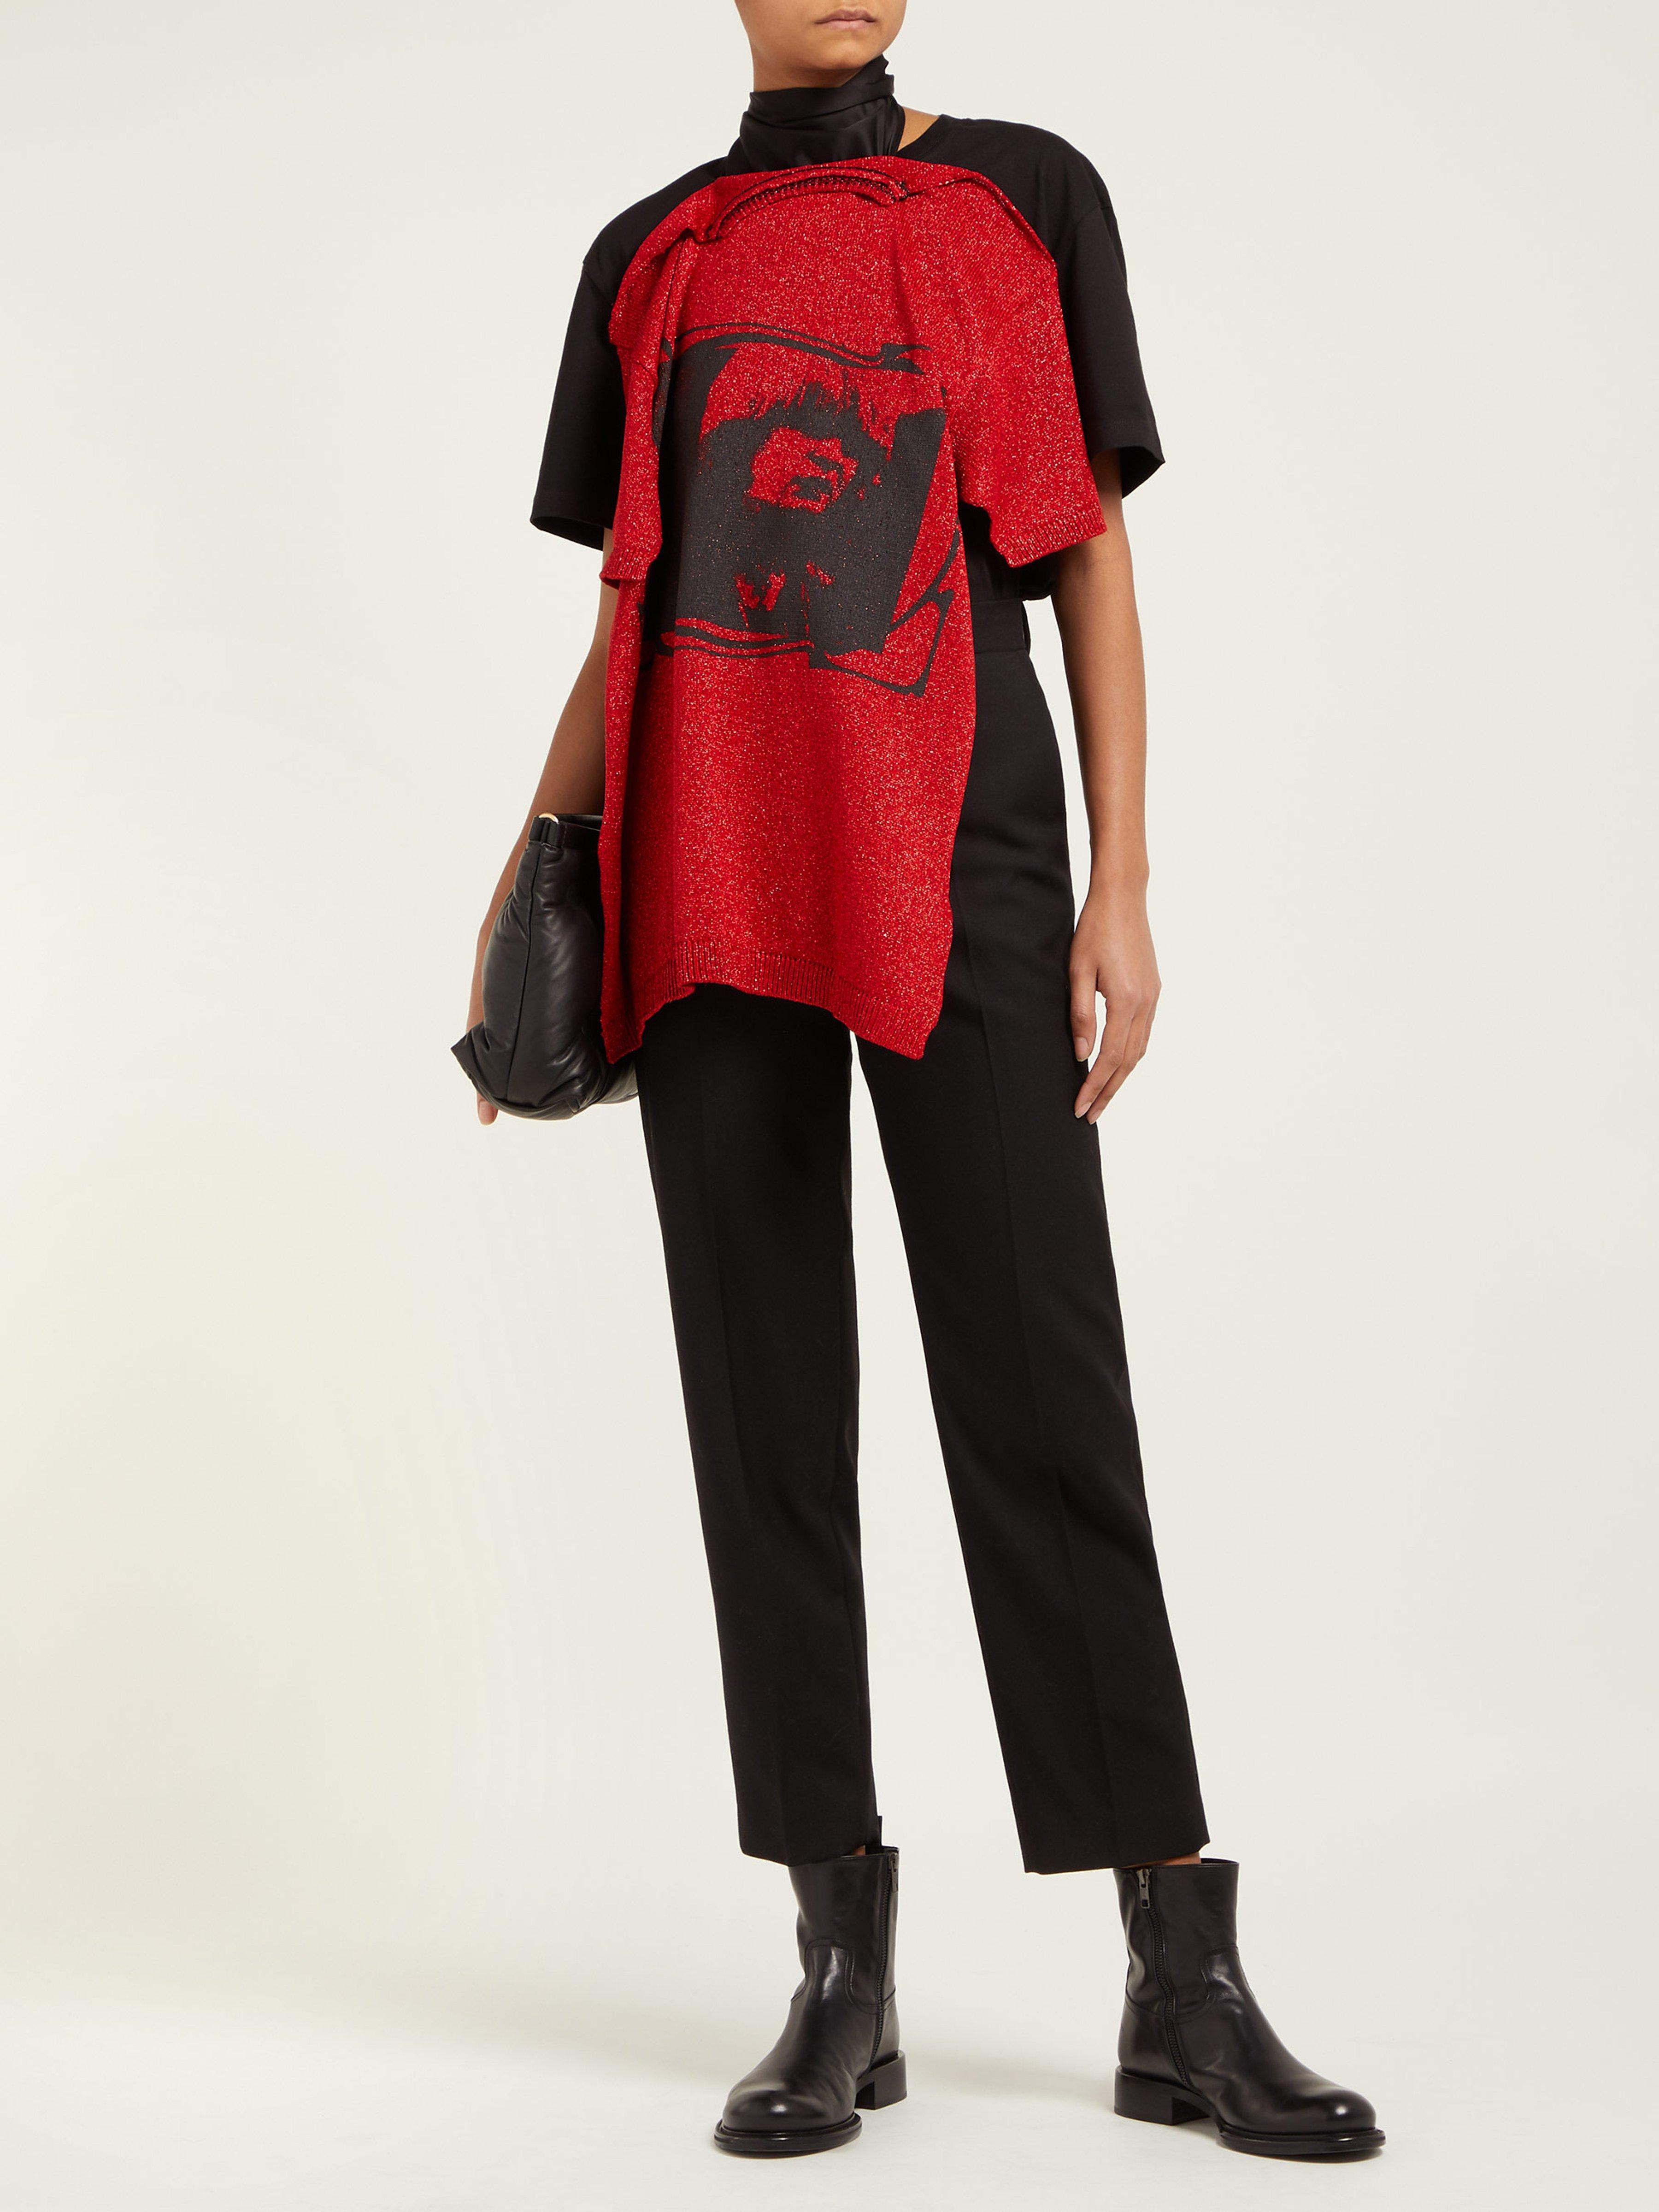 10c7f702354fdb Raf Simons - Red Toyah Print T Shirt Style Scarf - Lyst. View fullscreen